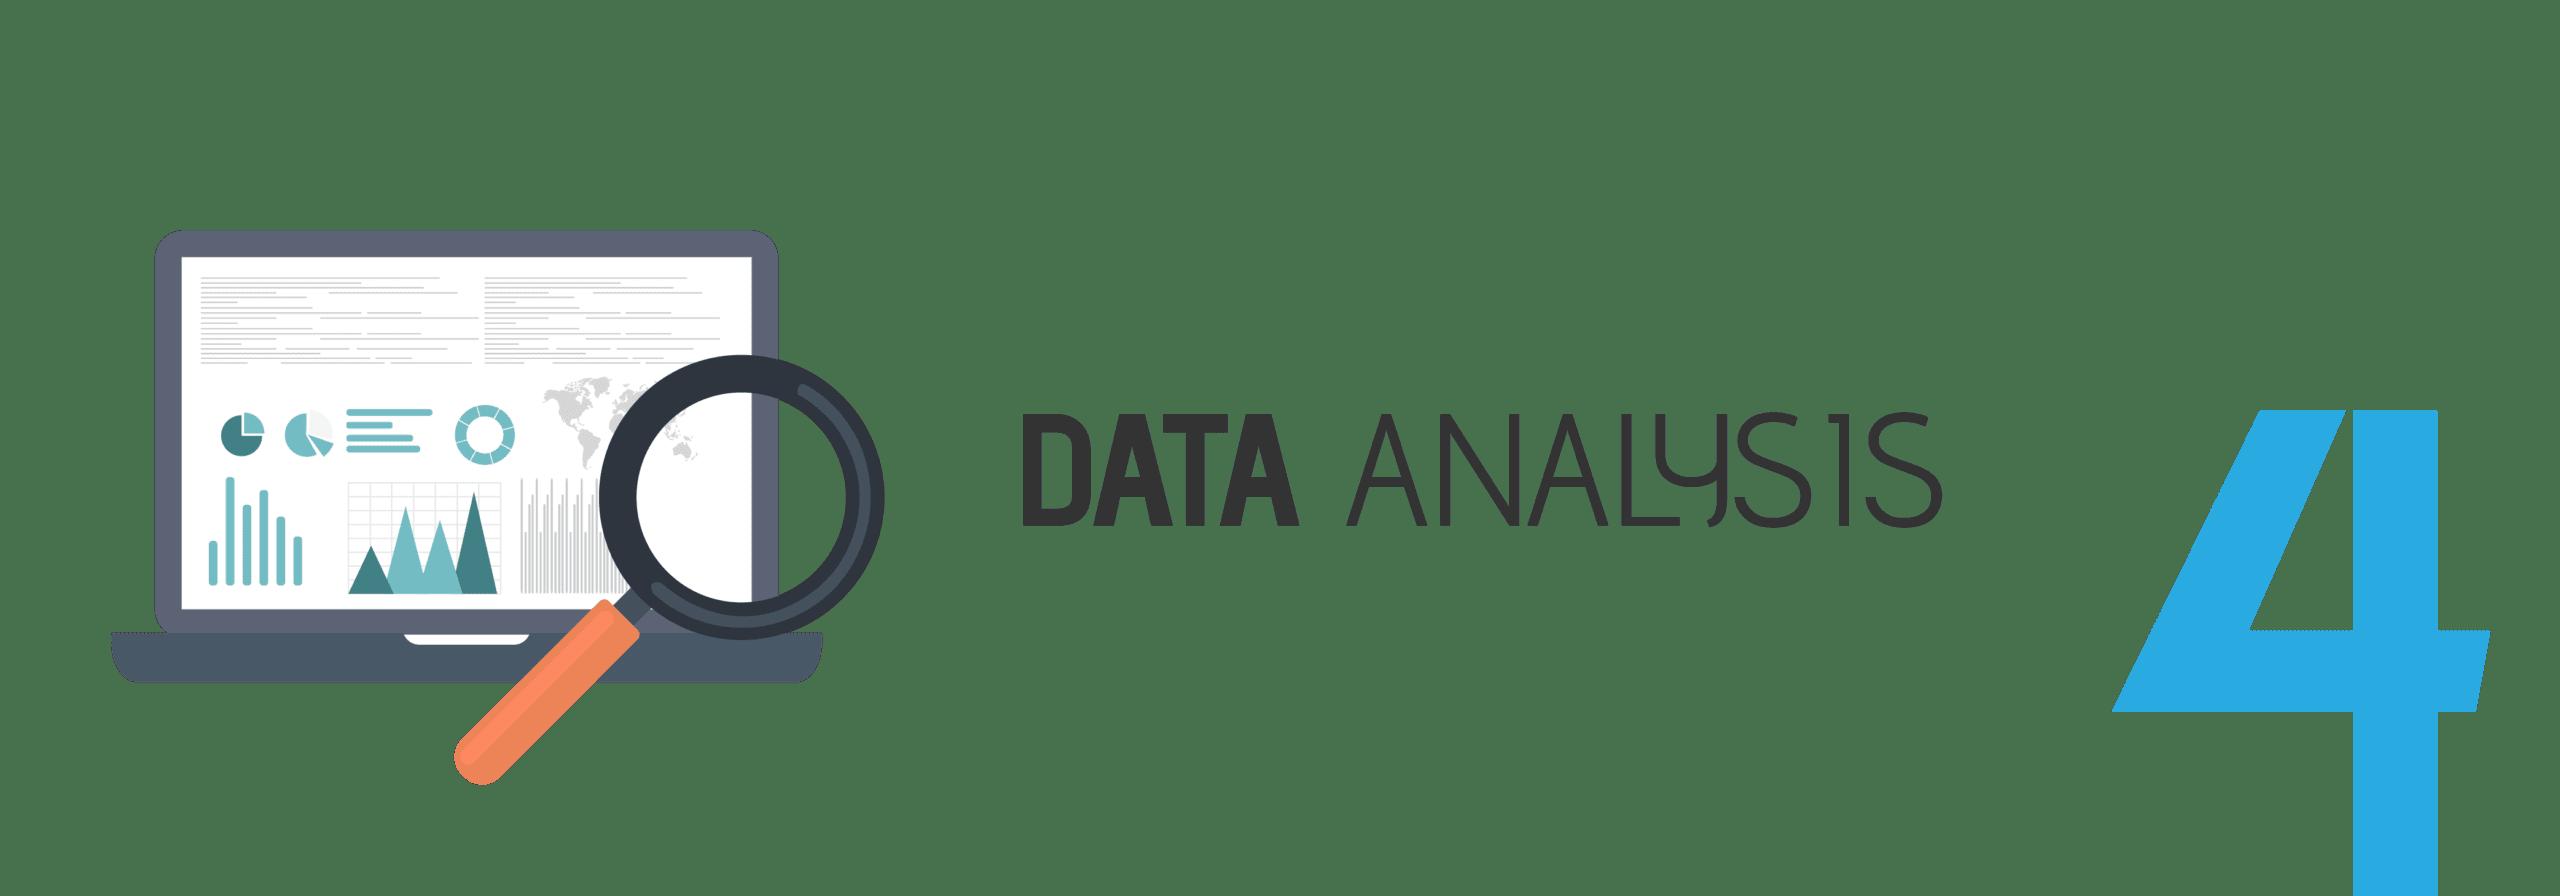 Data Analysis in Digital Marketing Benefits